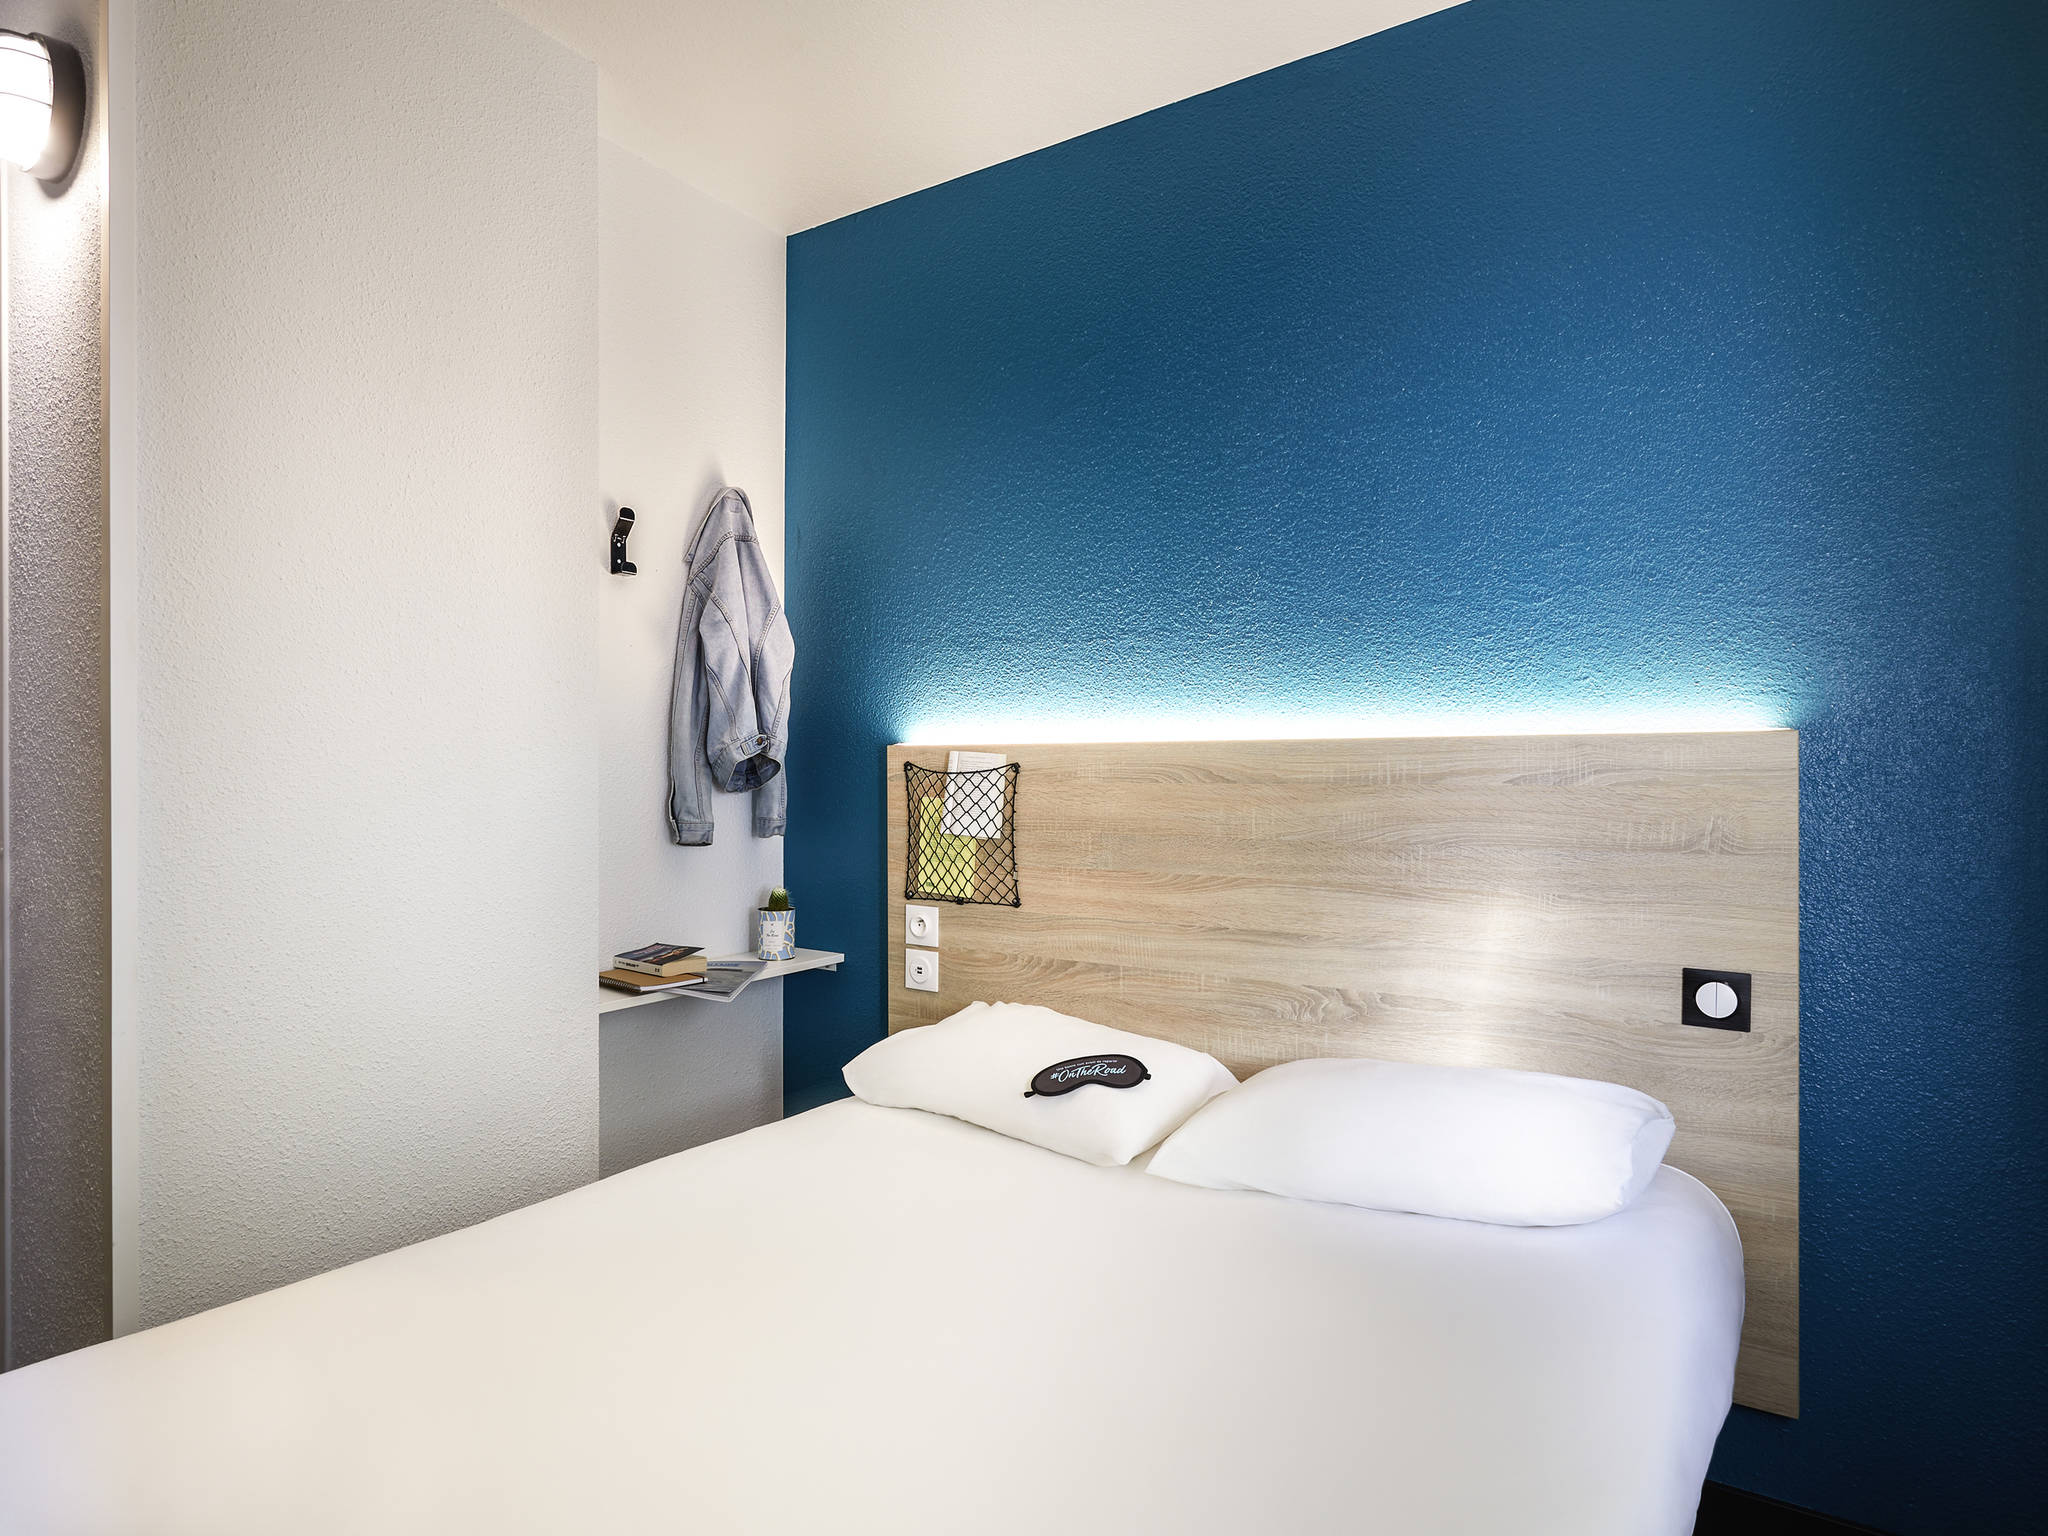 فندق - hotelF1 Vannes